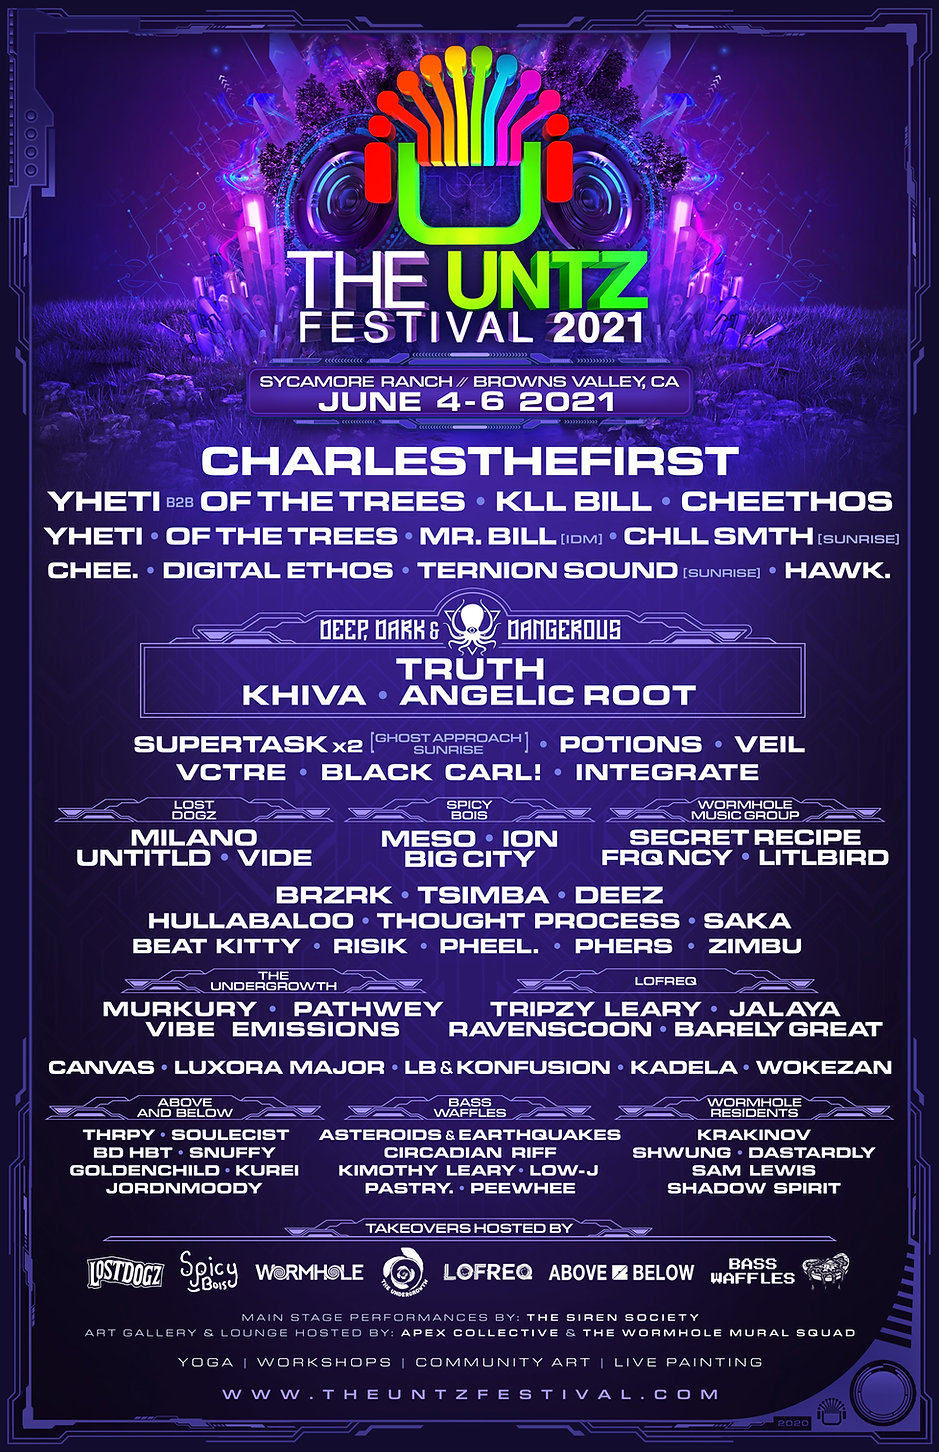 UntzFest2021_Lineup.jpg